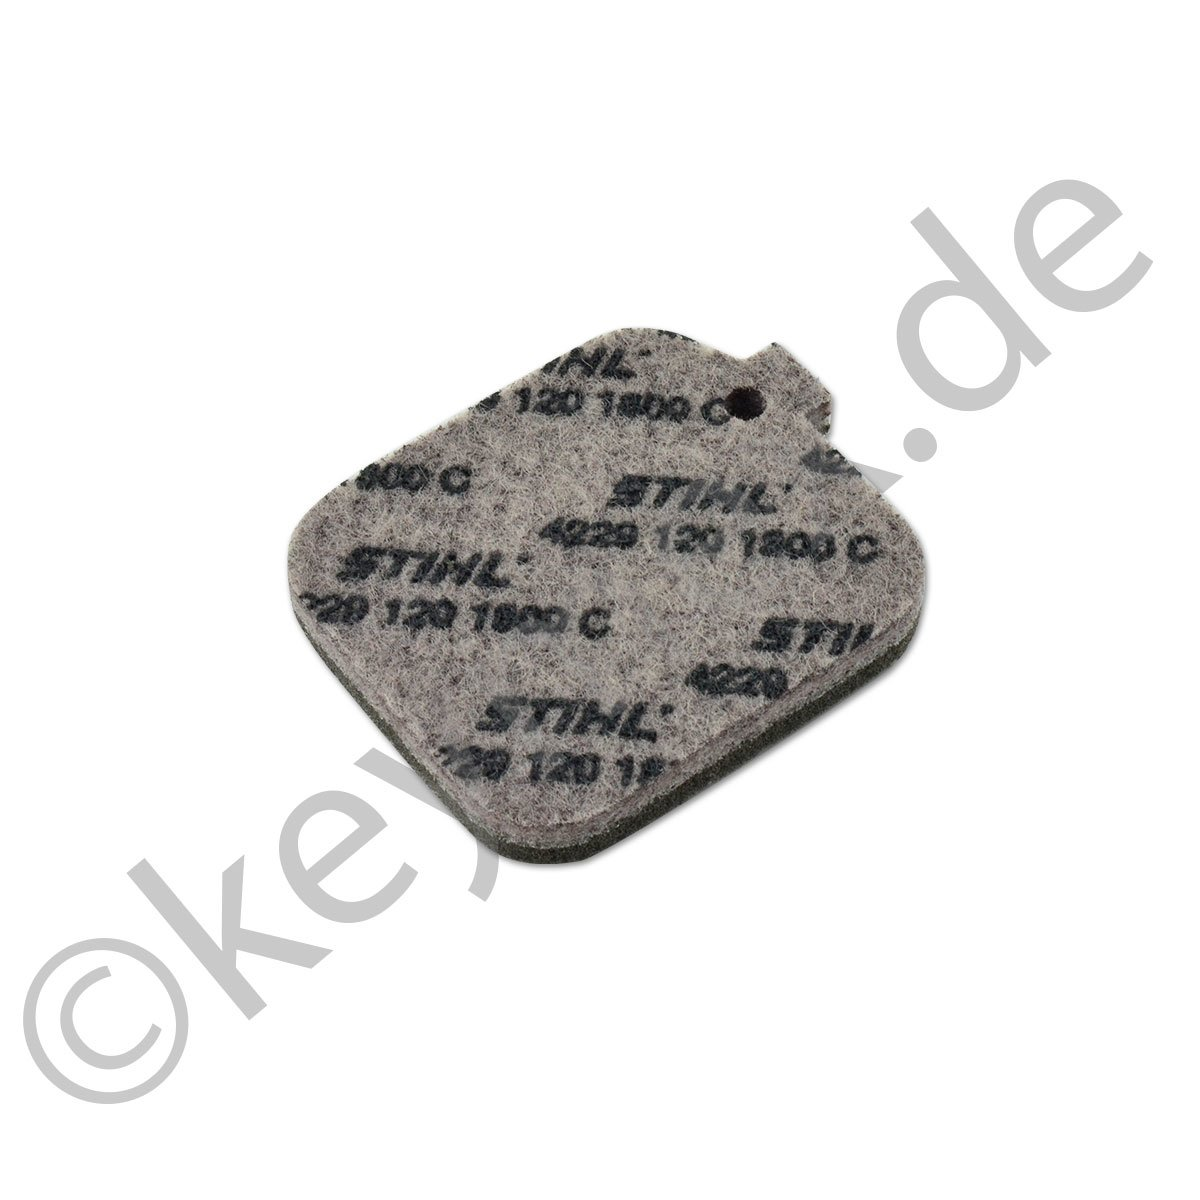 Neu Original Stihl SH 55 SH 85 Filter Luftfilter 4229 120 1800